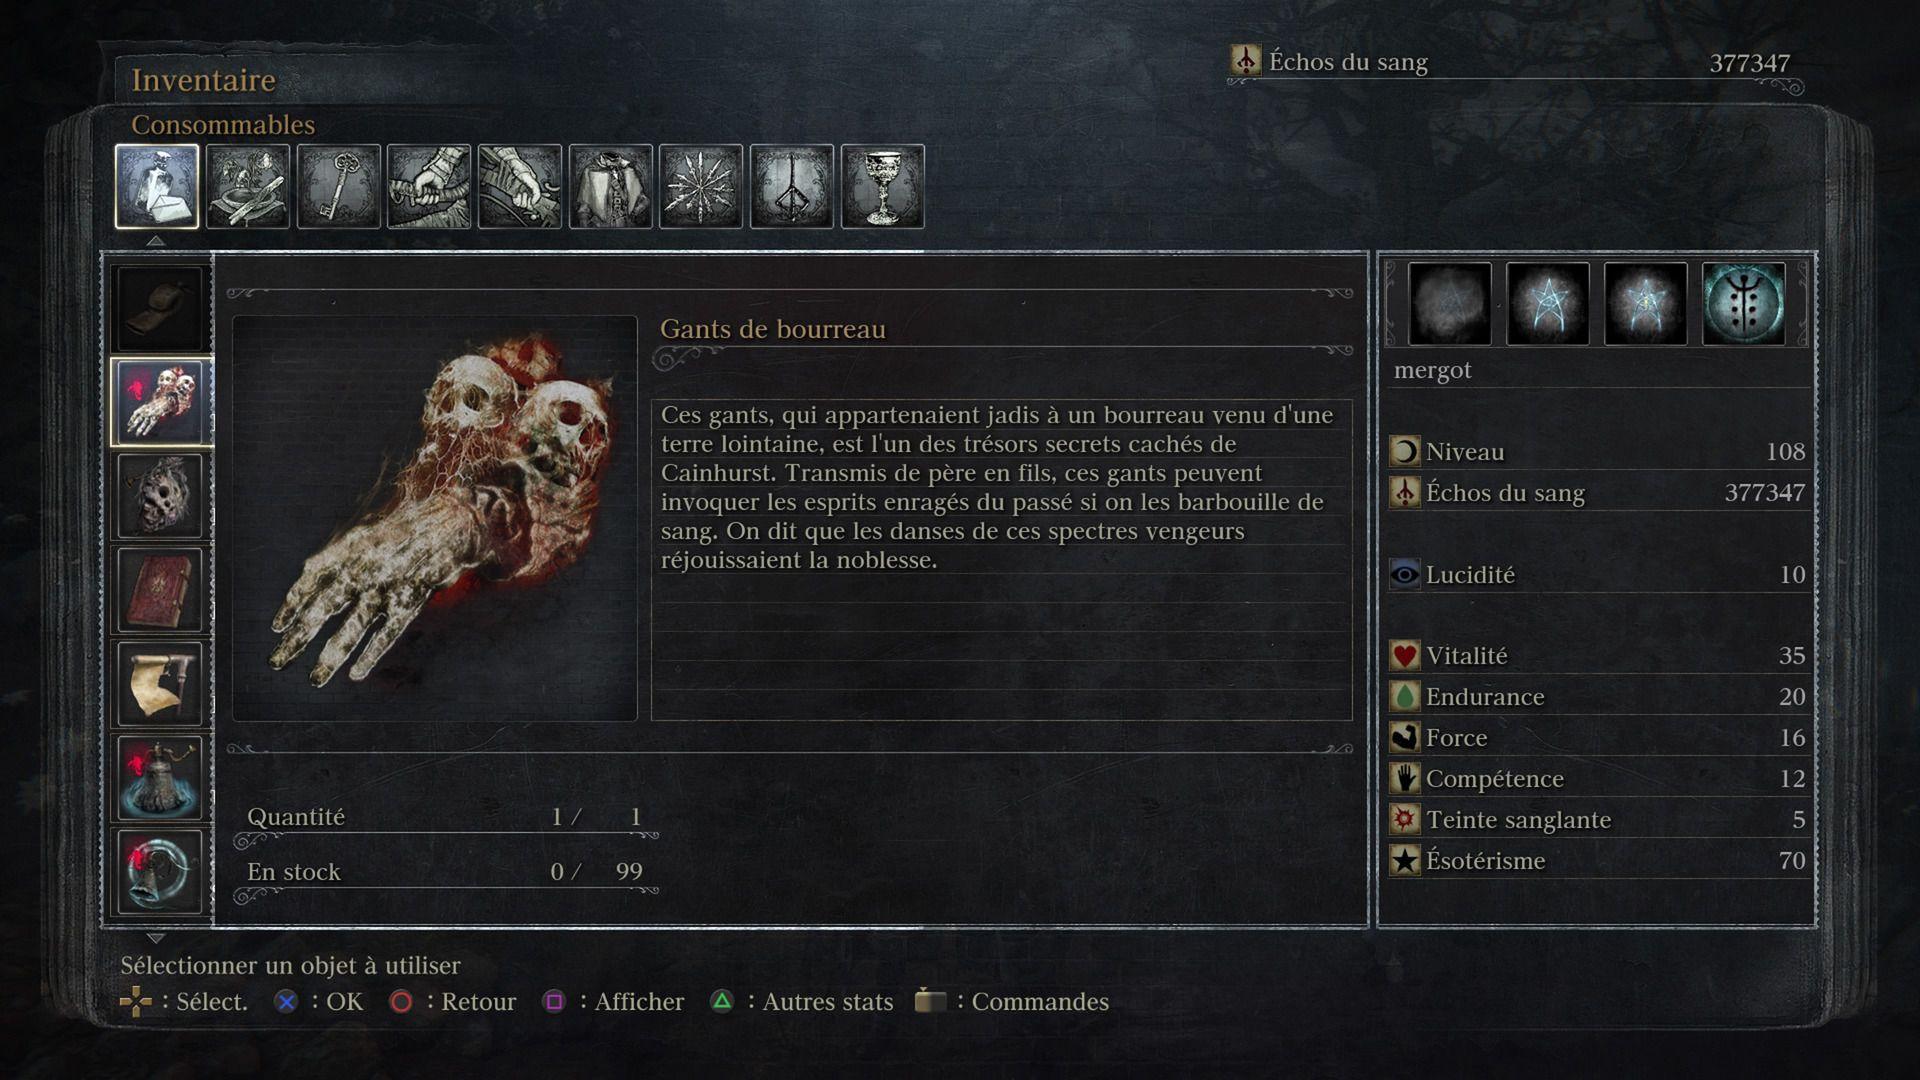 Bloodborne-gants de bourreau-leblogdewilly